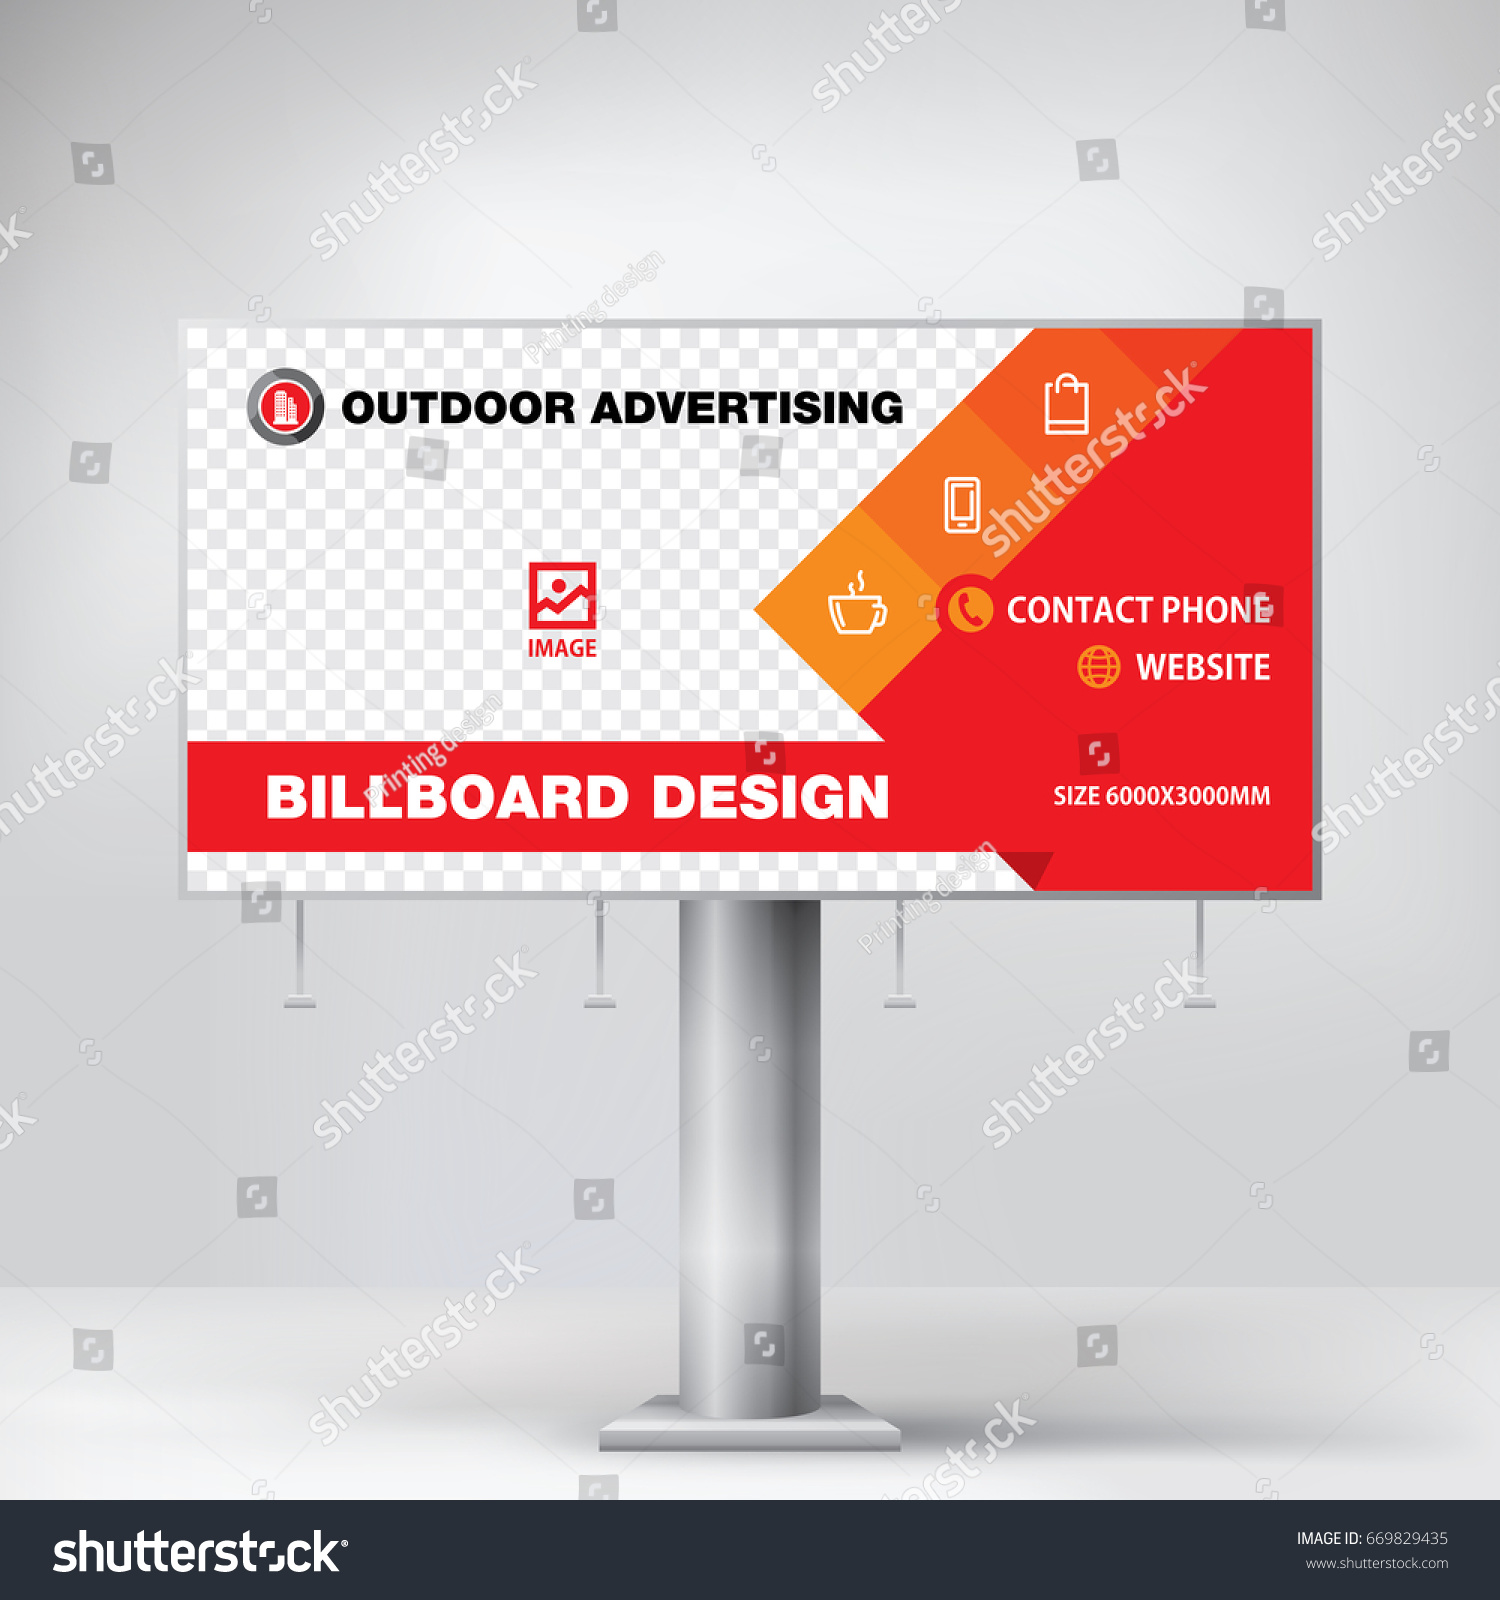 Billboard Design Advertising Stand Layout Stock-Vektorgrafik ...